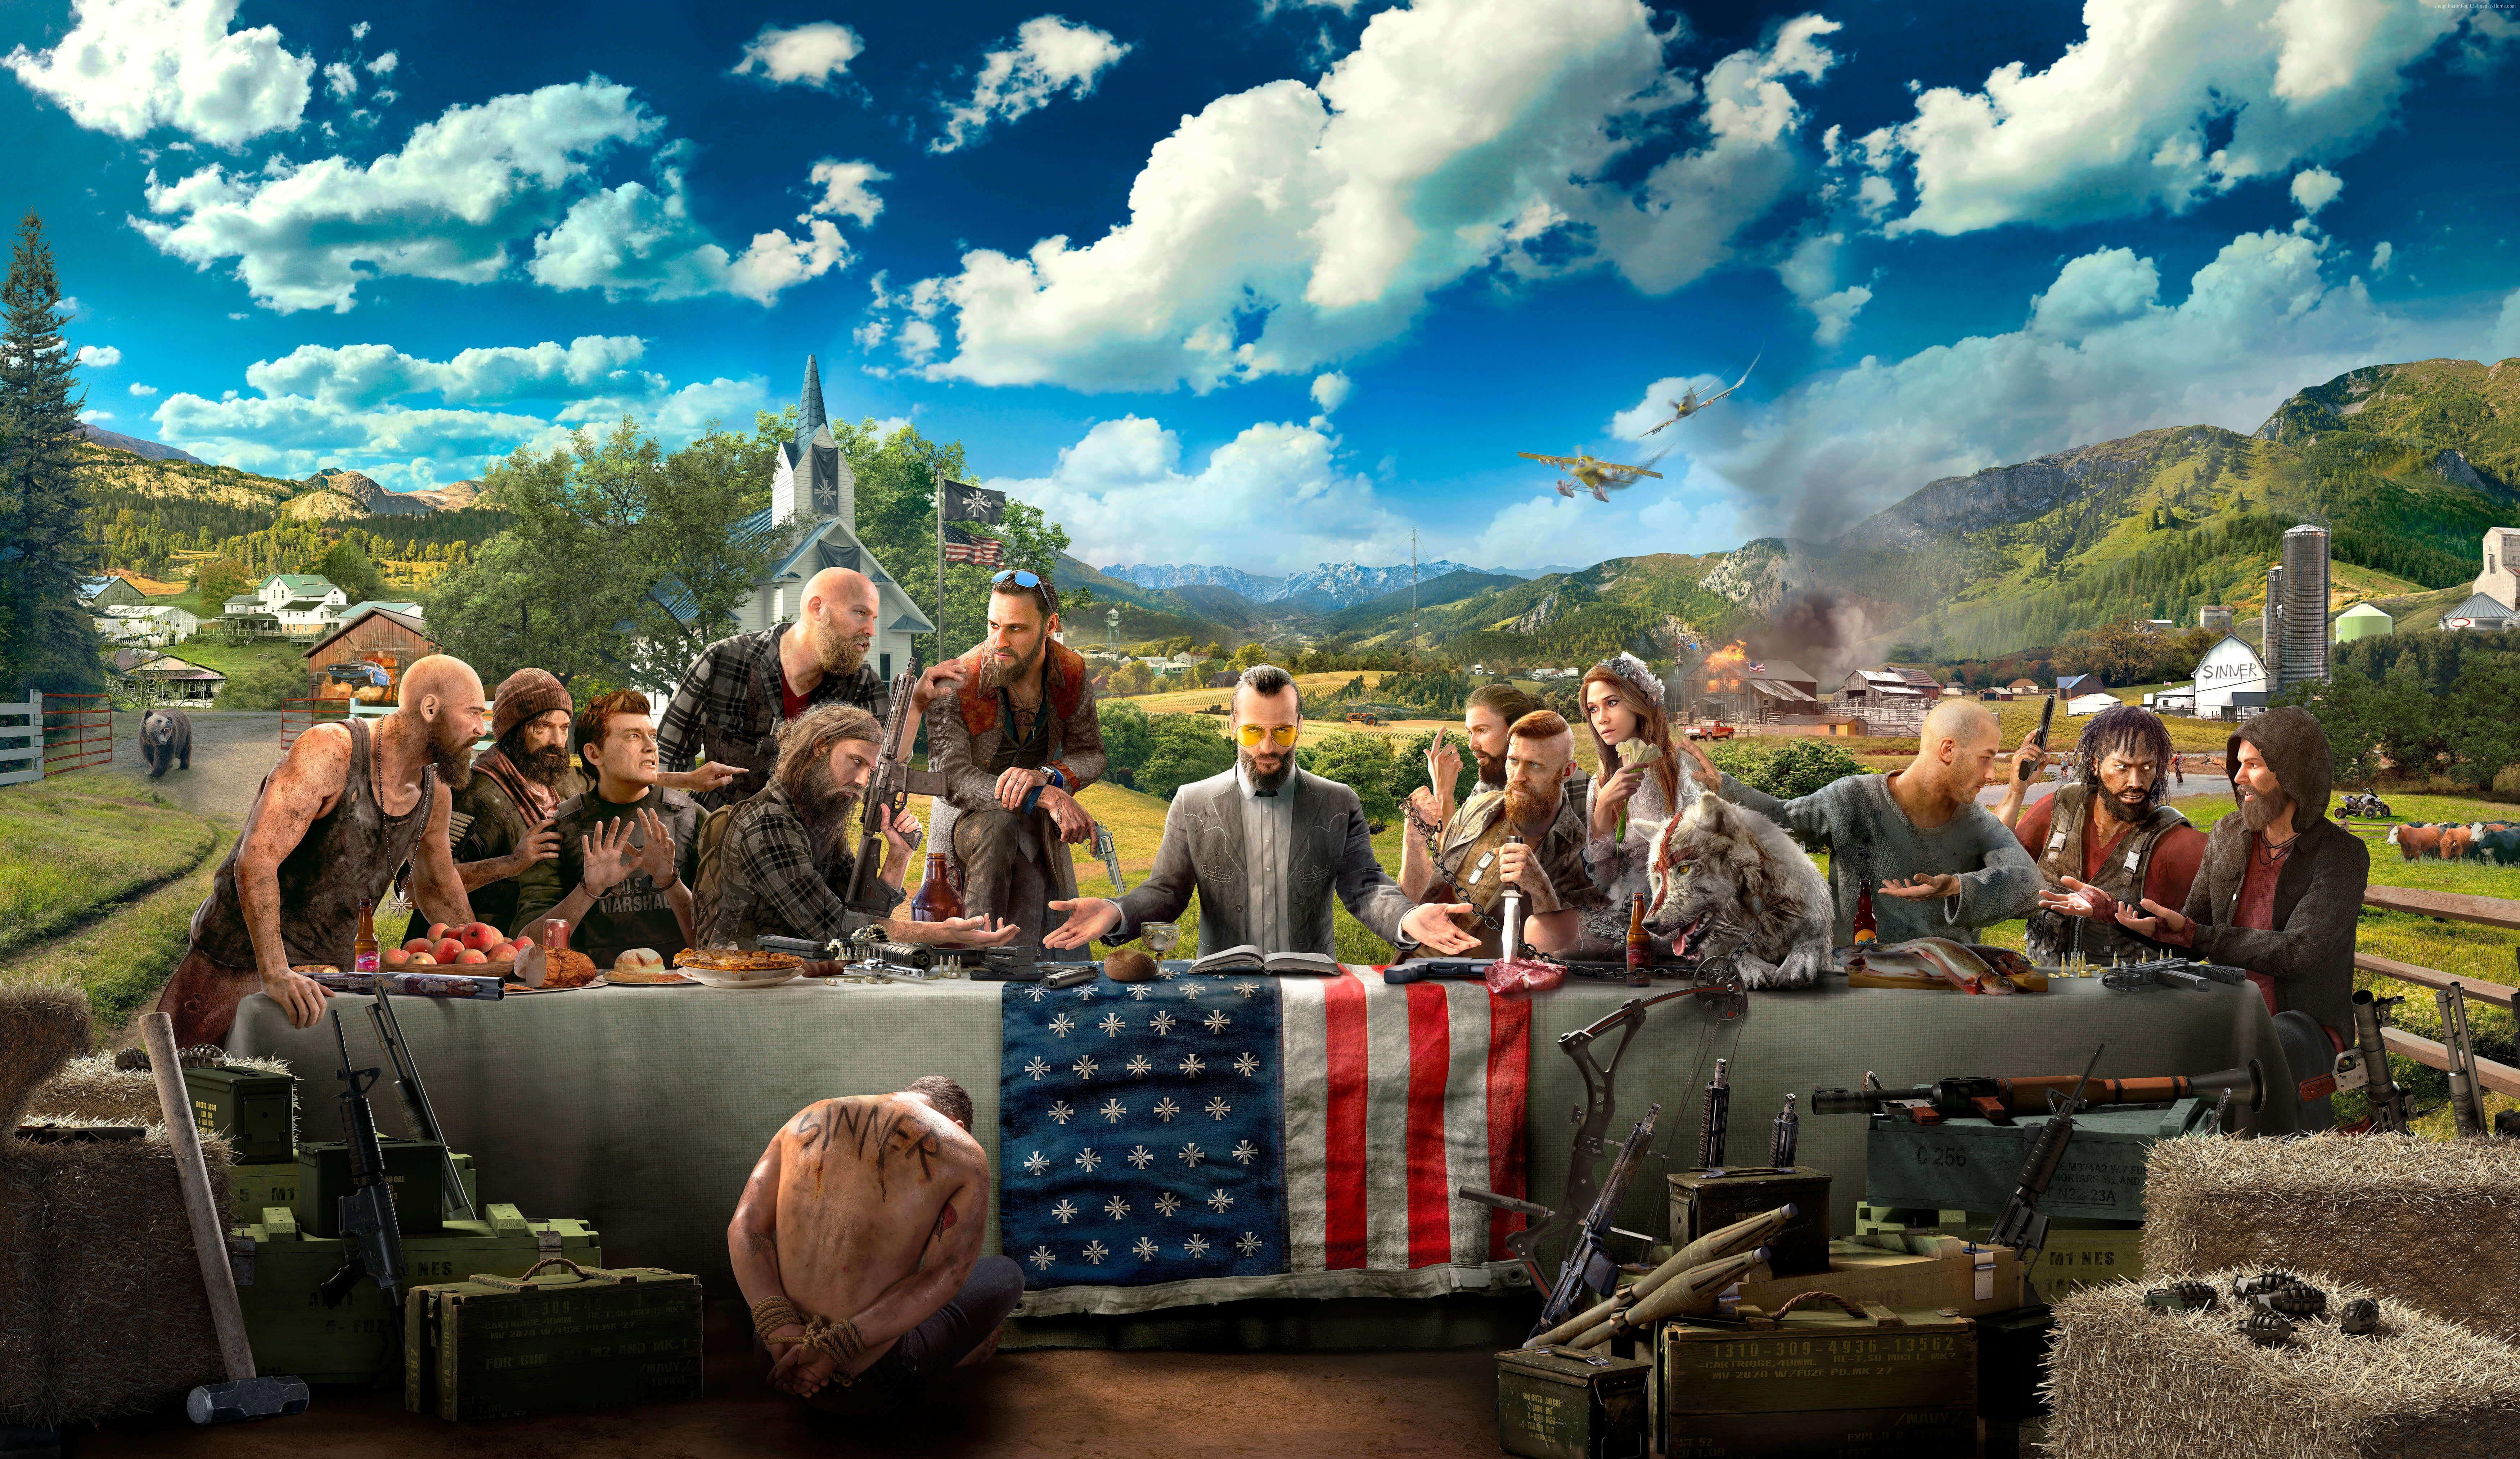 E3 2017 Hd 4k Far Cry 5 5k Wallpaper Hdwallpaper Desktop In 2020 Samsung Wallpaper Far Cry 5 Wallpaper Downloads